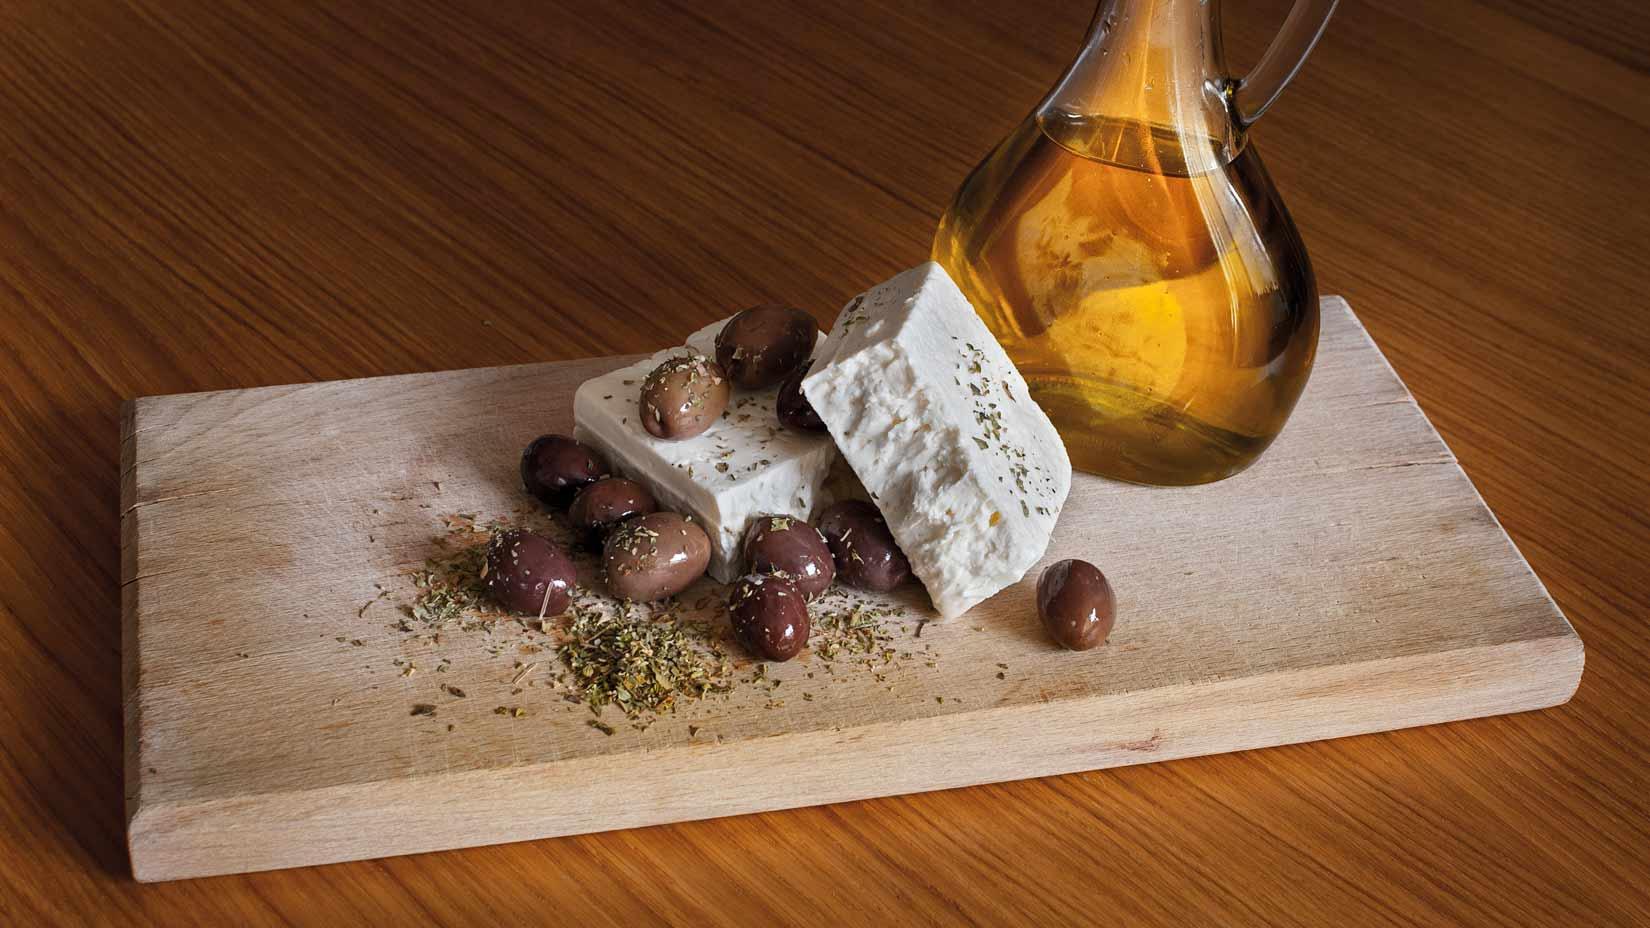 Základní suroviny pro olivový chléb, ελιόψωμο - olivy, balkánský sýr, oregano a olivový olej